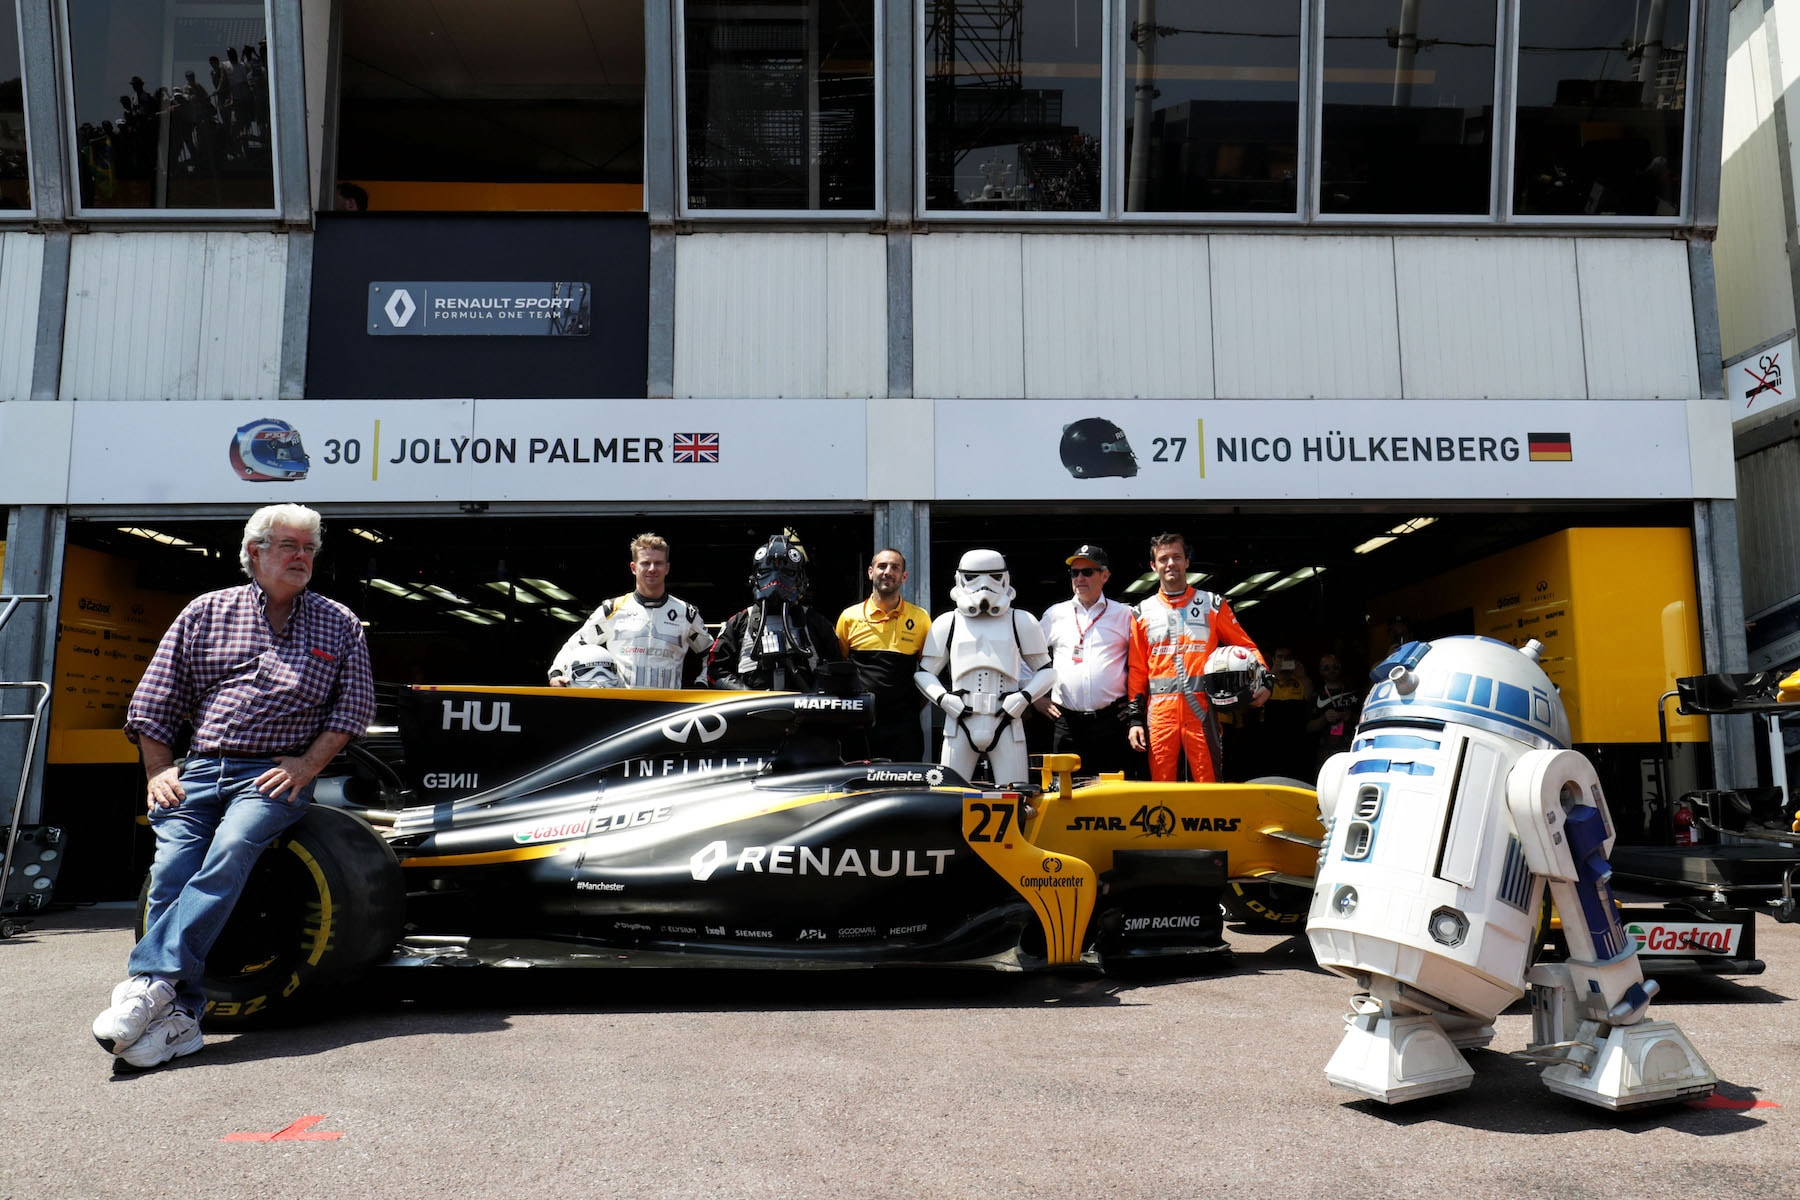 A 2017 Monaco GP Renault and Star Wars 1 copy.jpg